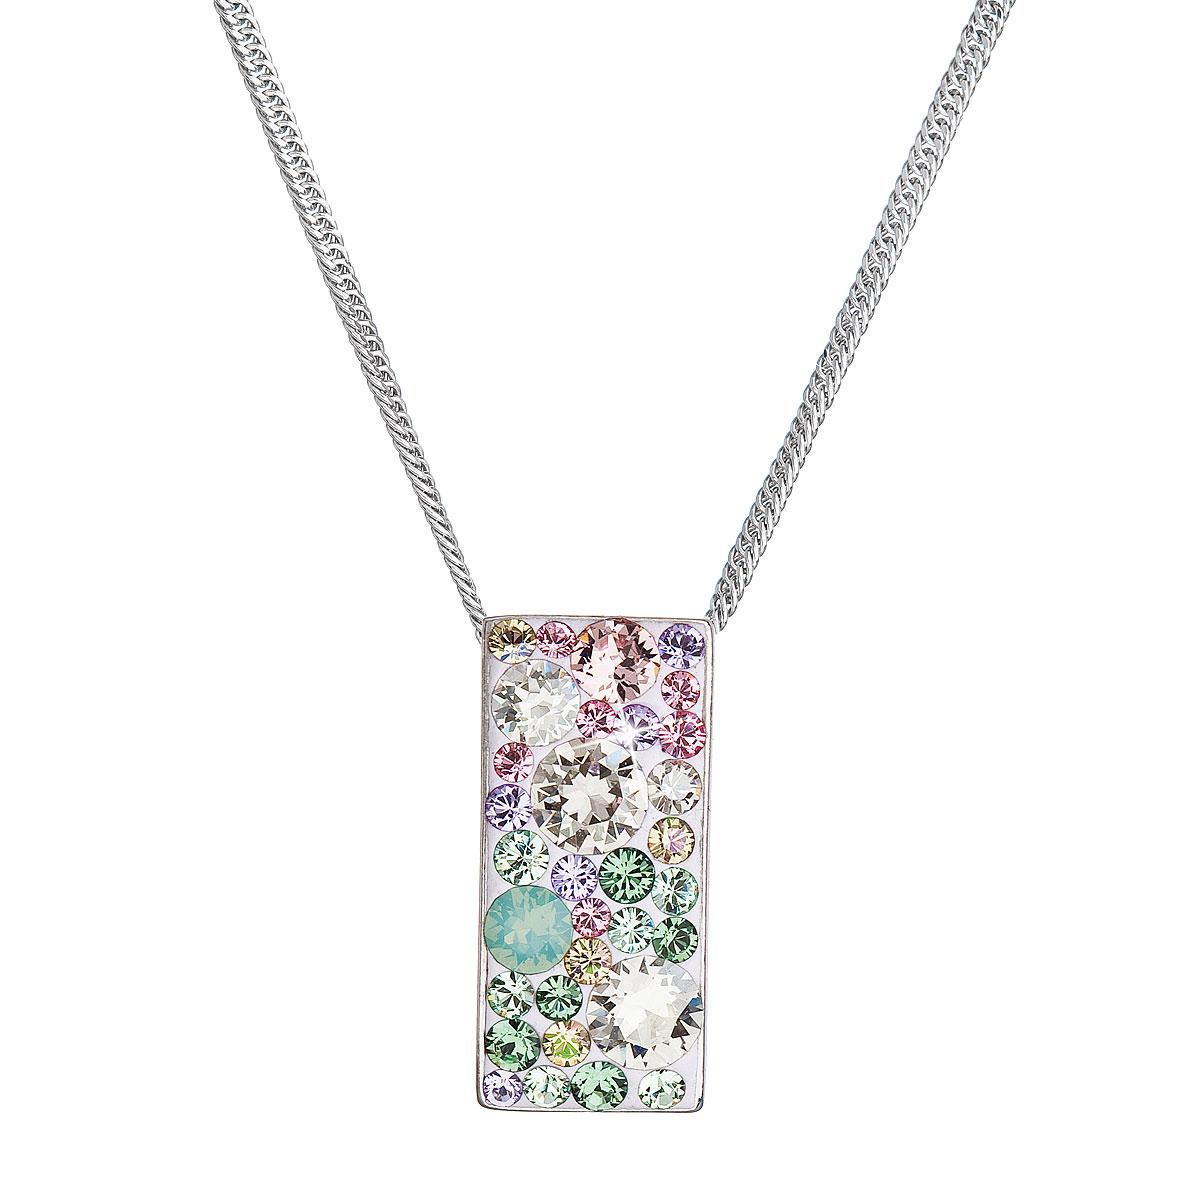 Evolution Group Stříbrný náhrdelník se Swarovski krystaly růžovo-zelený obdélník 32074.3 sakura